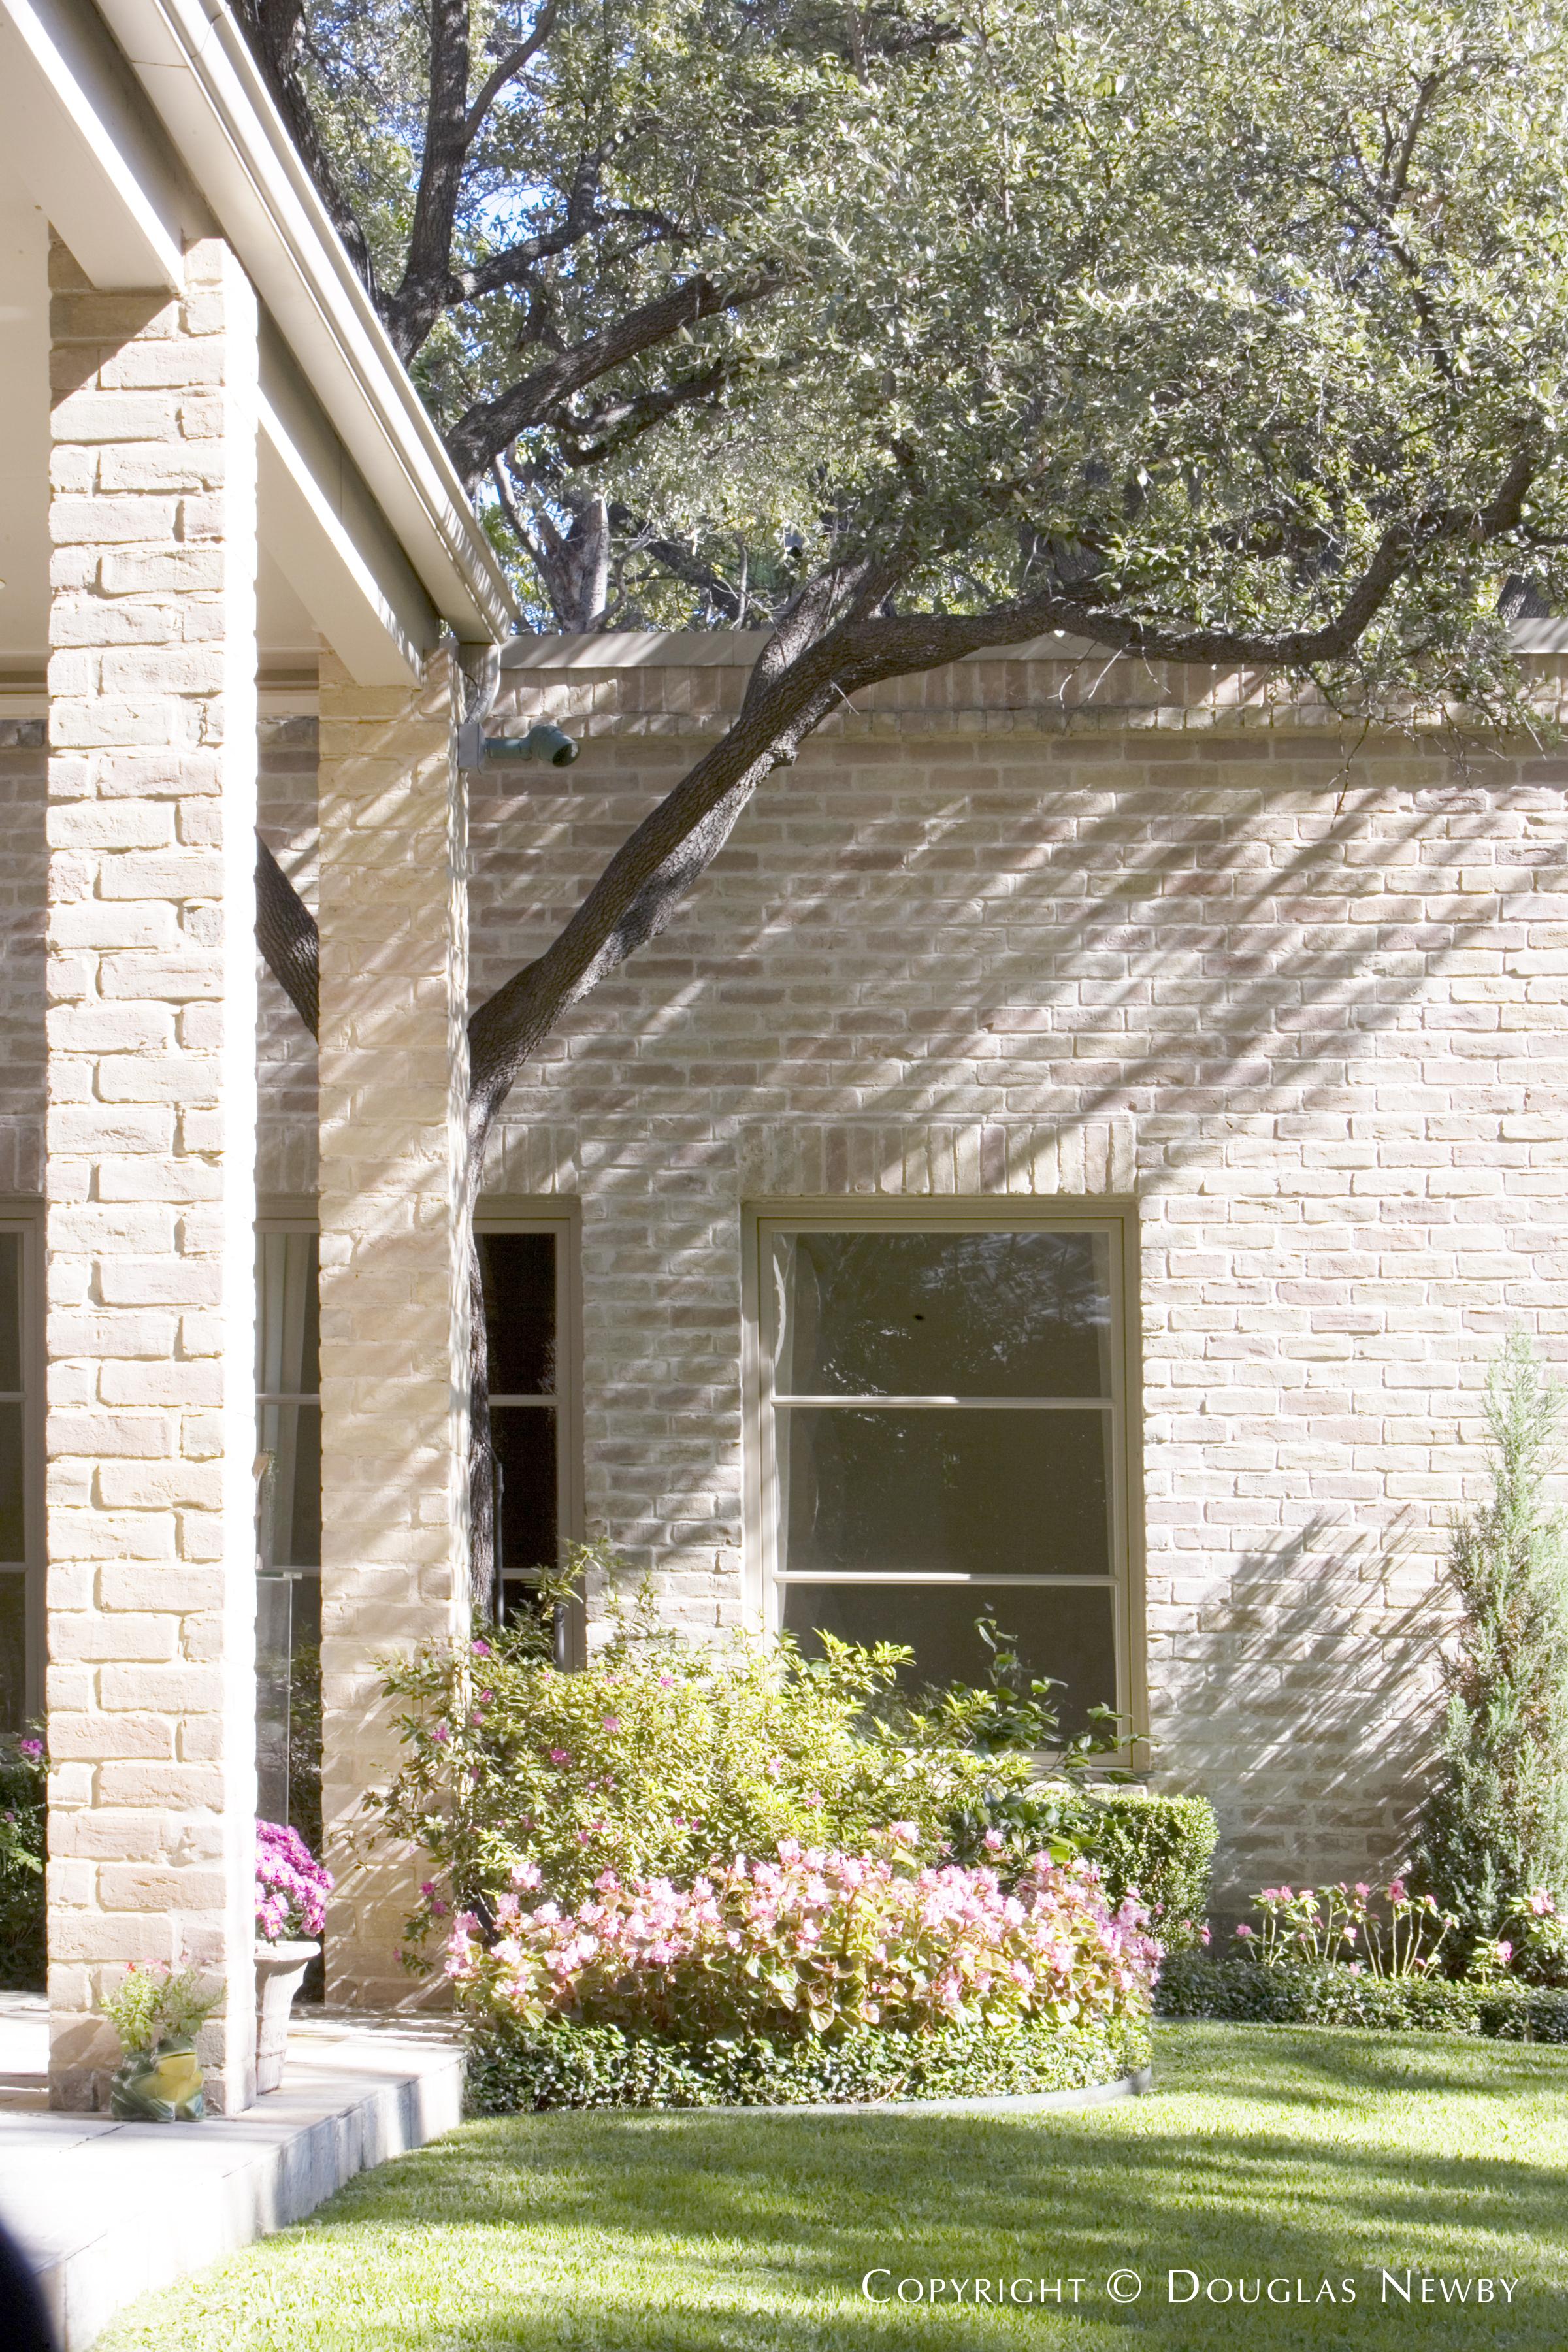 Preston Hollow Original Home sitting on 0.392 Acres